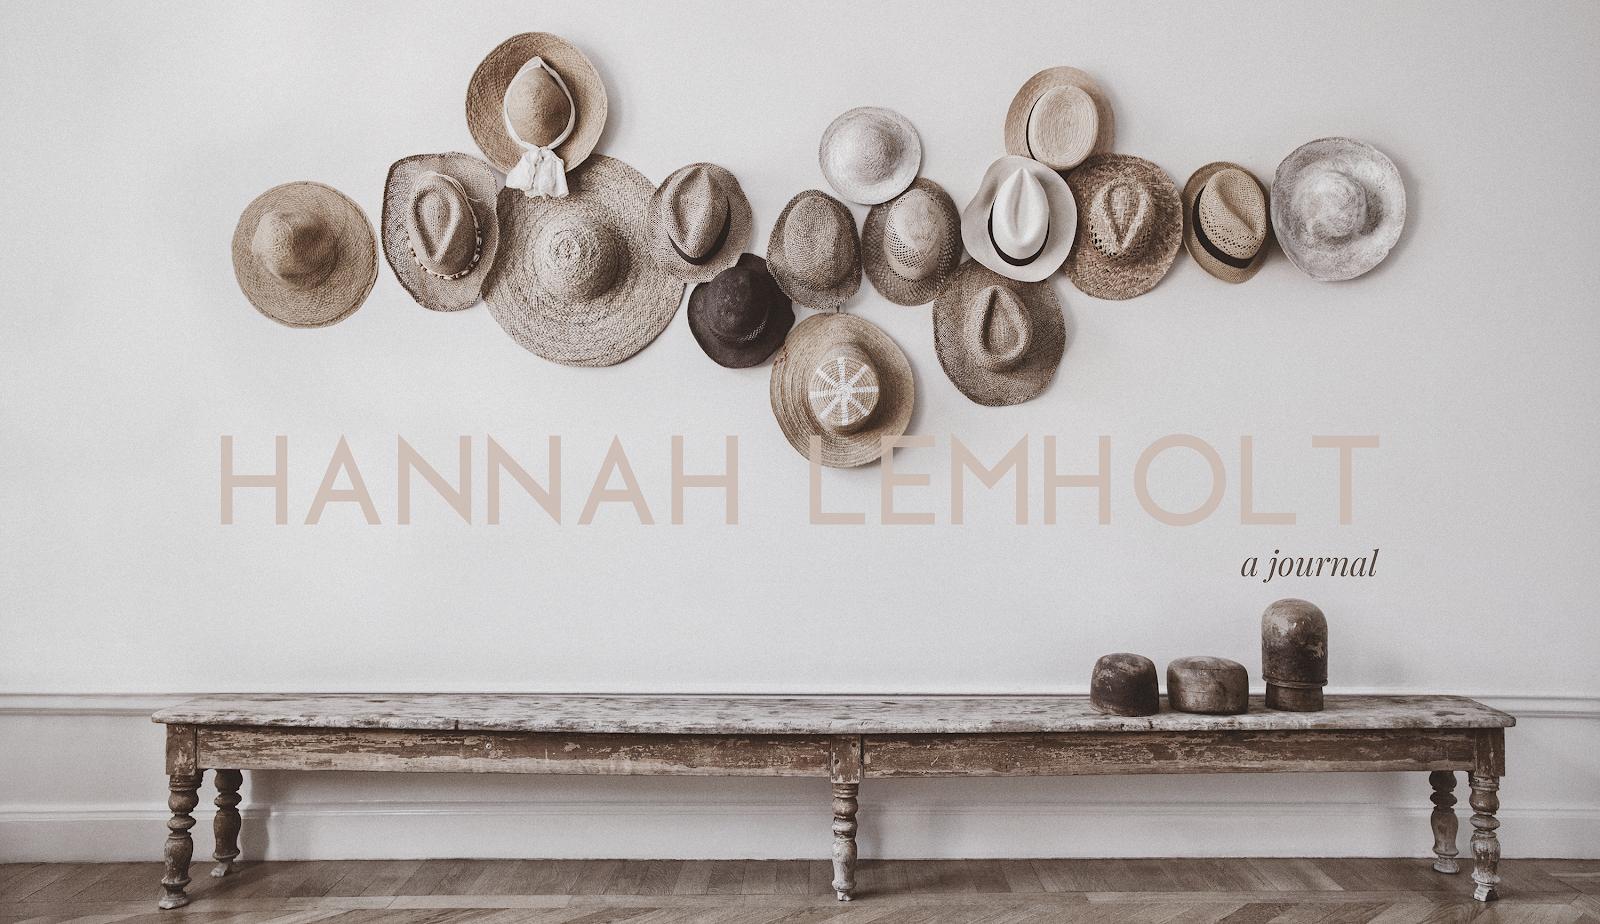 Hannah Lemholt English